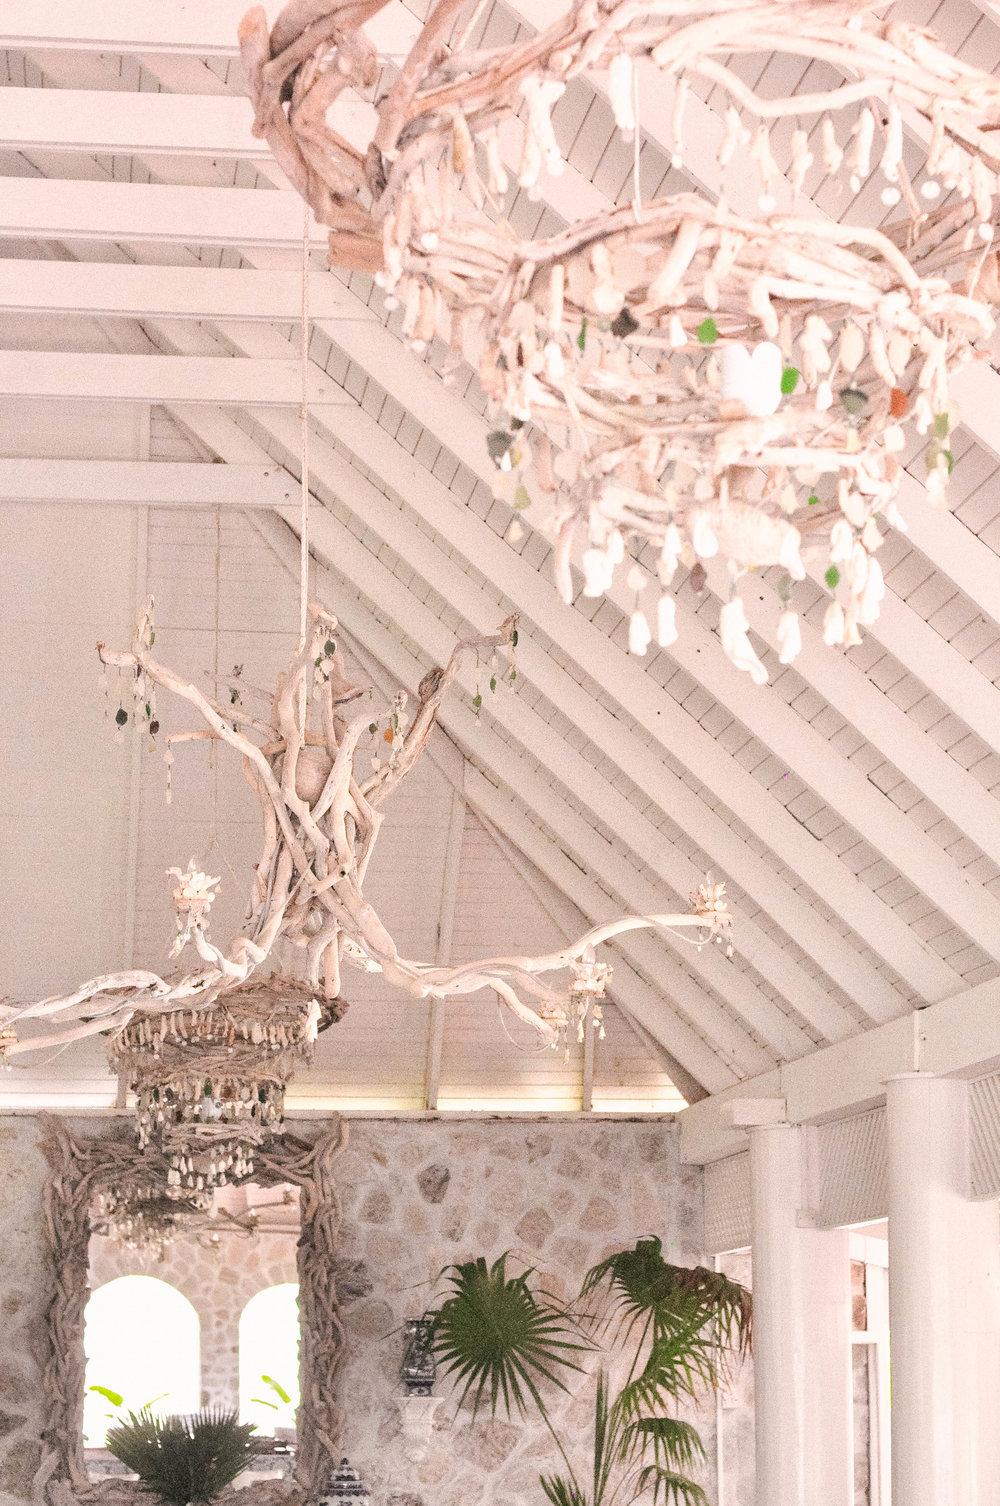 White ceiling decor at Sugar Reef Bequia